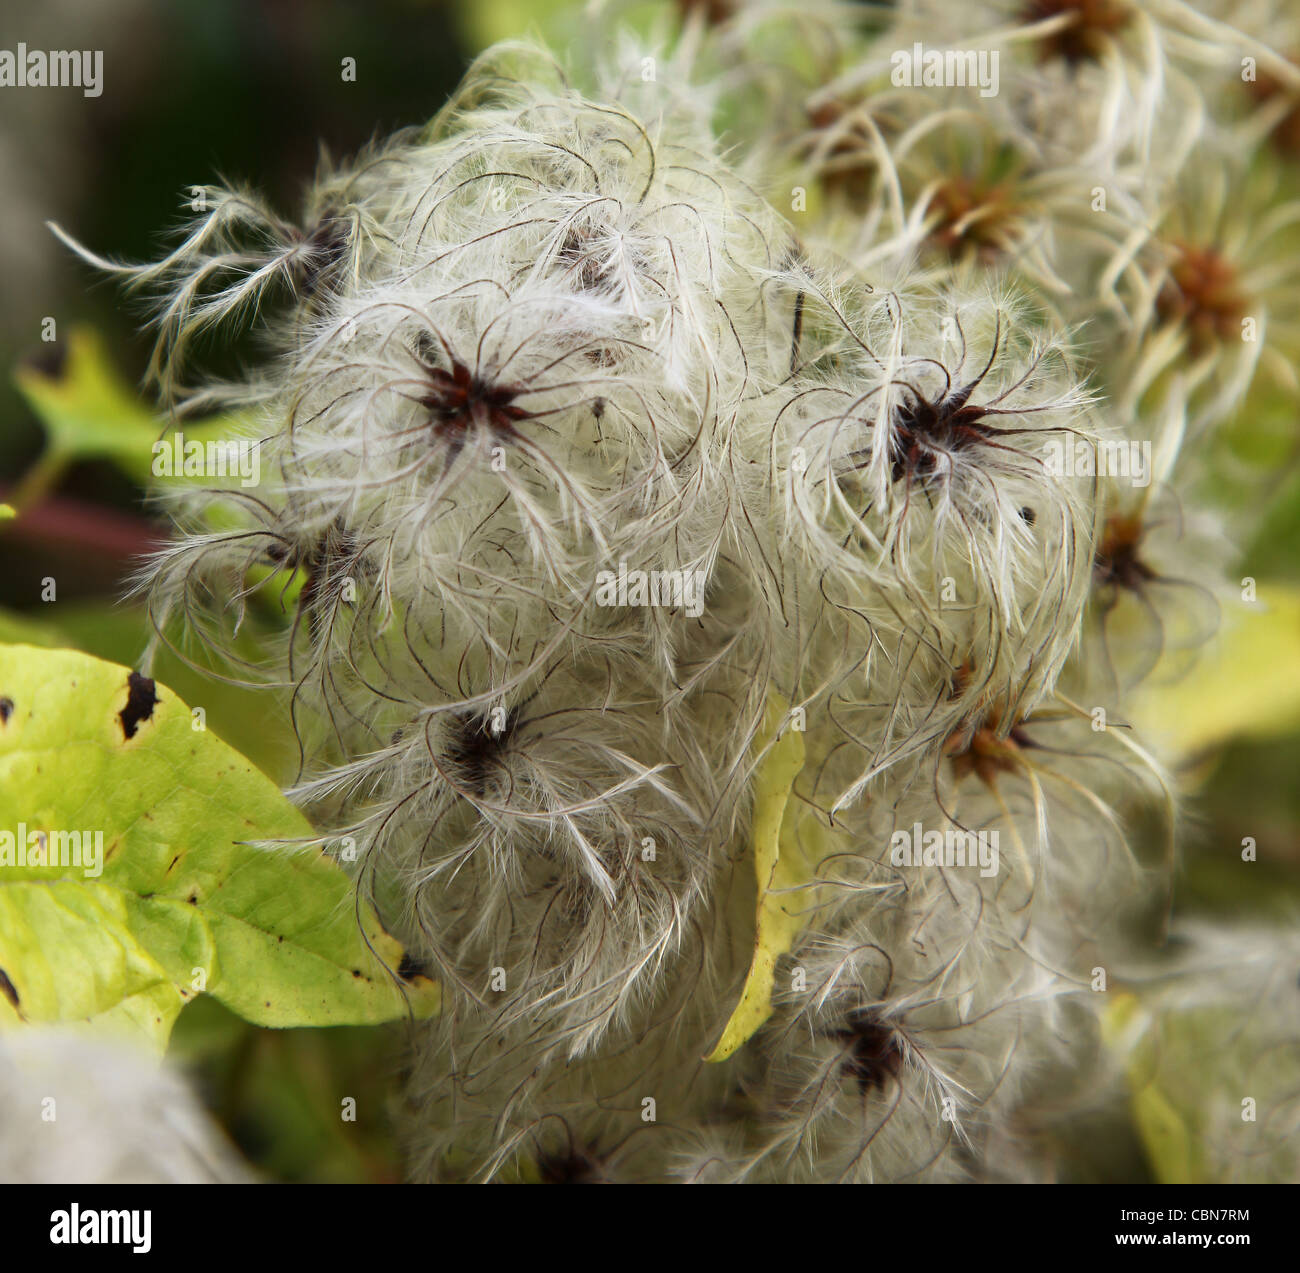 Wild Clematis vitalba, a climbing shrub also called Old man's beard and Traveler's Joy - Stock Image